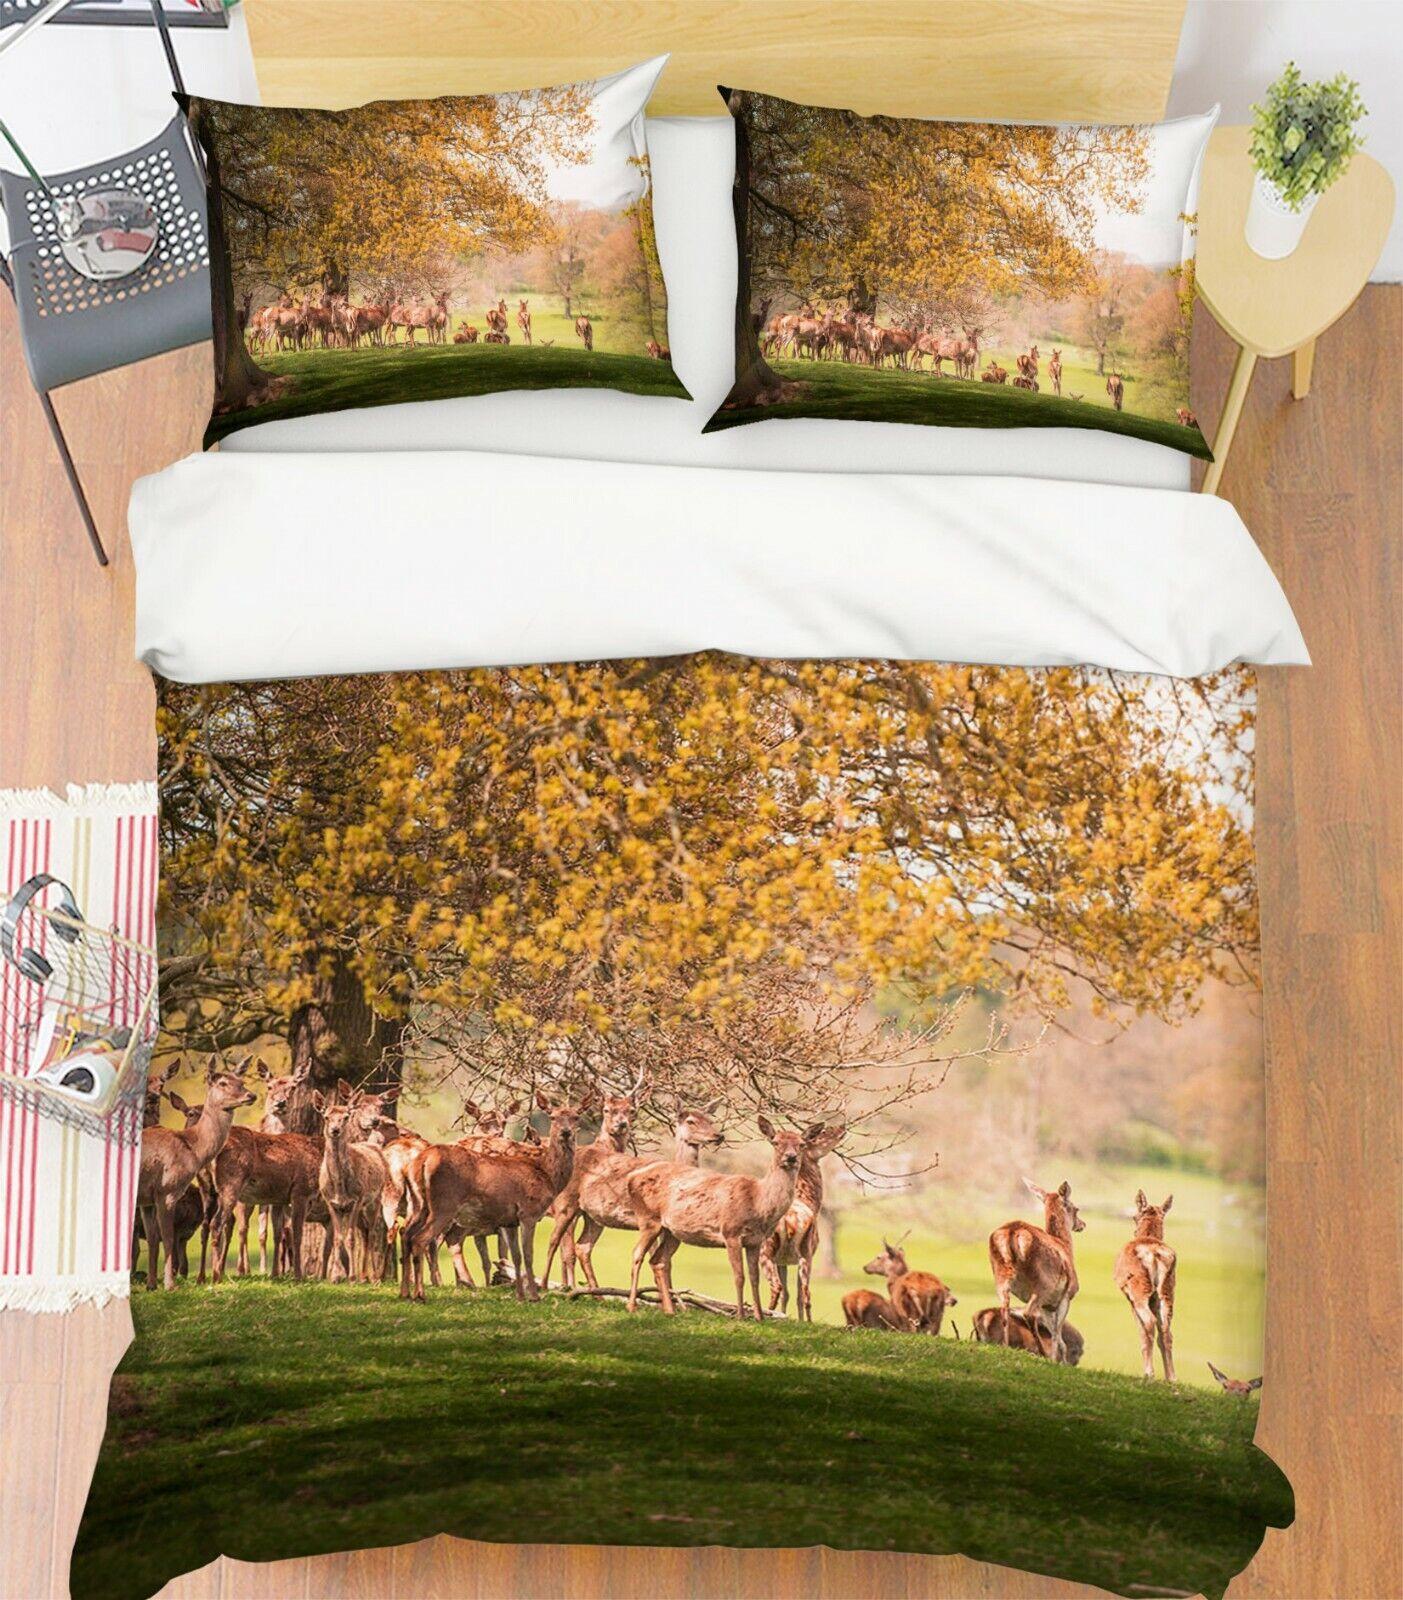 3D Raindeer Coutry P23 Animal Bed Pillowcases Quilt Duvet Cover Set Queen Zoe